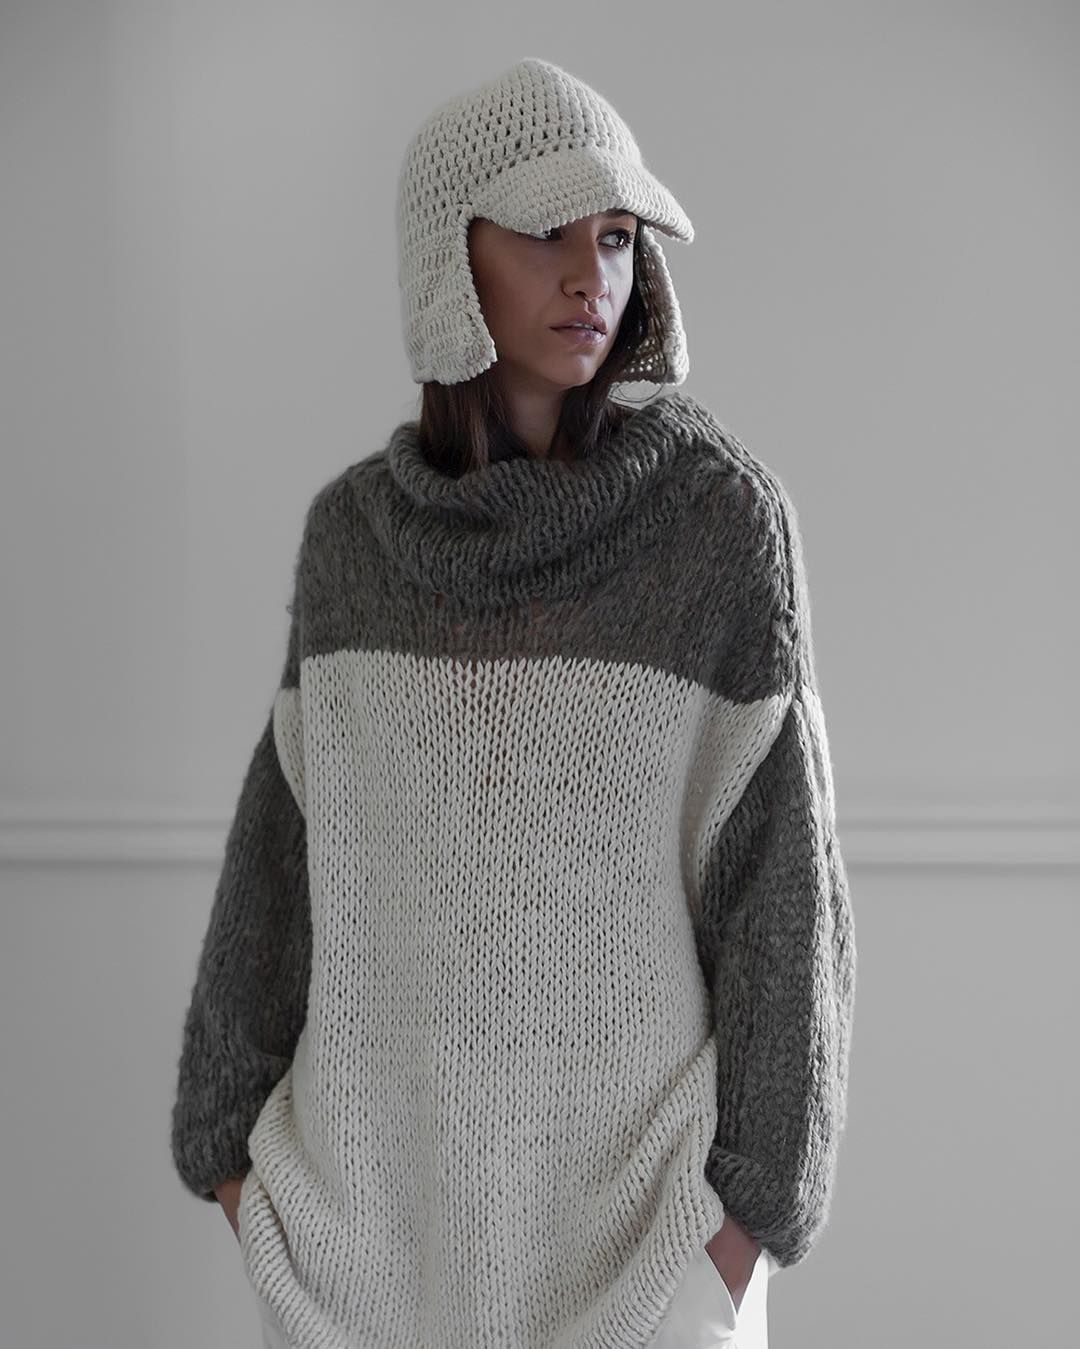 LOOK 13 | IRU AW2016 / 17 COLLECTION  MIRADA #handknitted SWEATER CALMA #crochet VISOR CAP  #lookbook #aw16 #autumn #winter #knitwear #contemporary #fashion #press #buyers #store #naturalfibers #values #diseñoargentino #showroom #hechoamano #otoño #invierno #maydíaz  ph. @emmalivingphoto  m. @natipetri  m.up @soleolveiramakeup